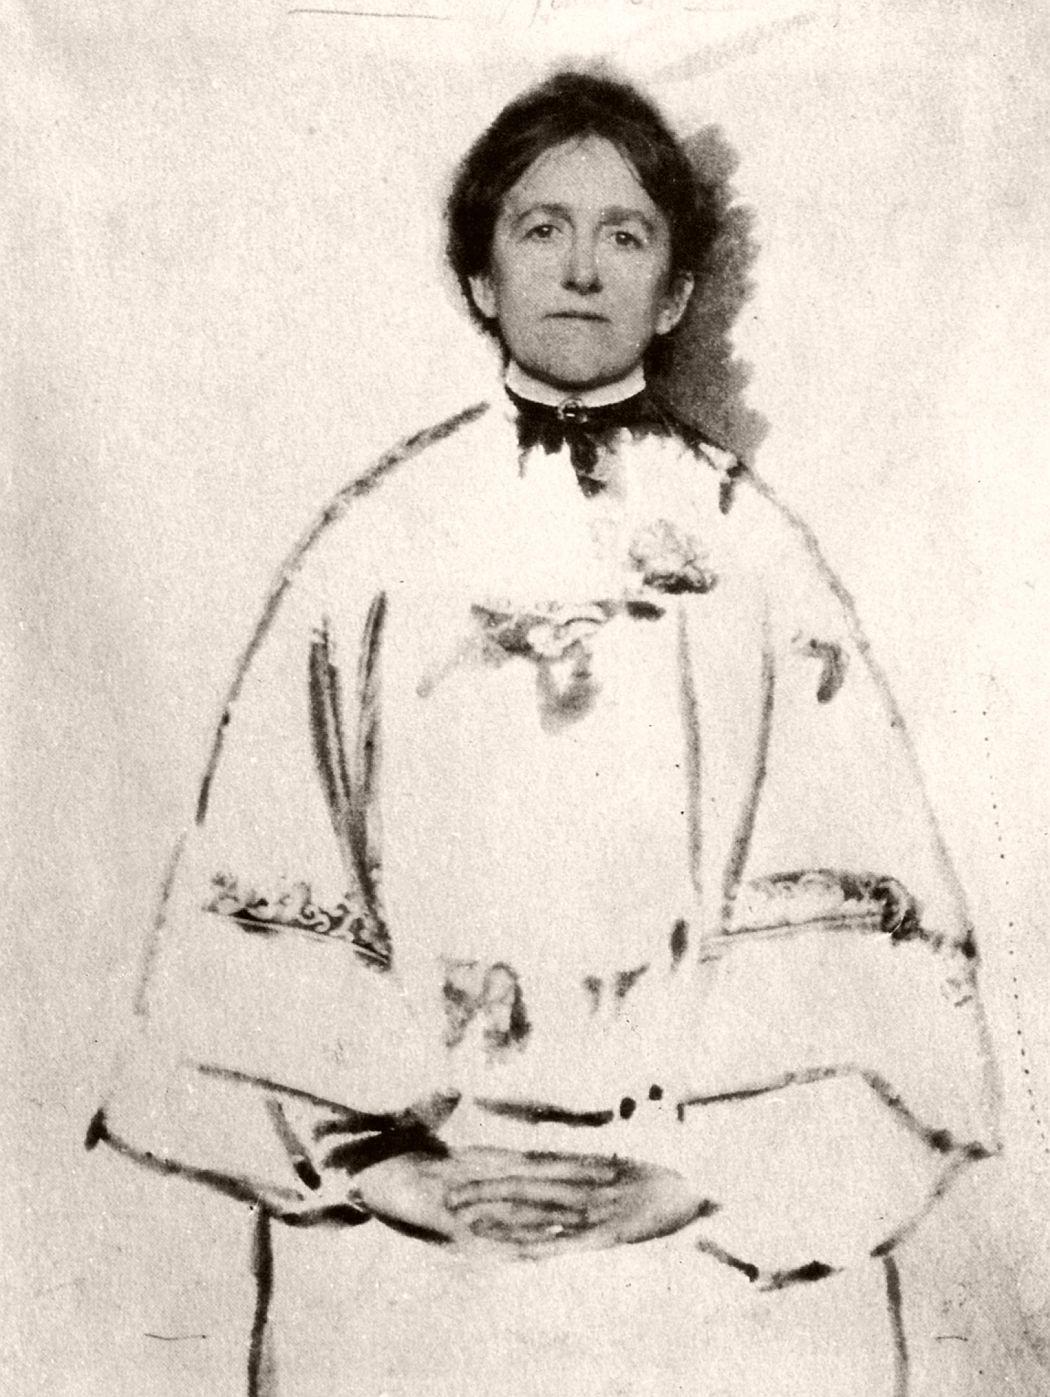 Portrait of the Photographer, manipulated self-portrait by Gertrude Käsebier